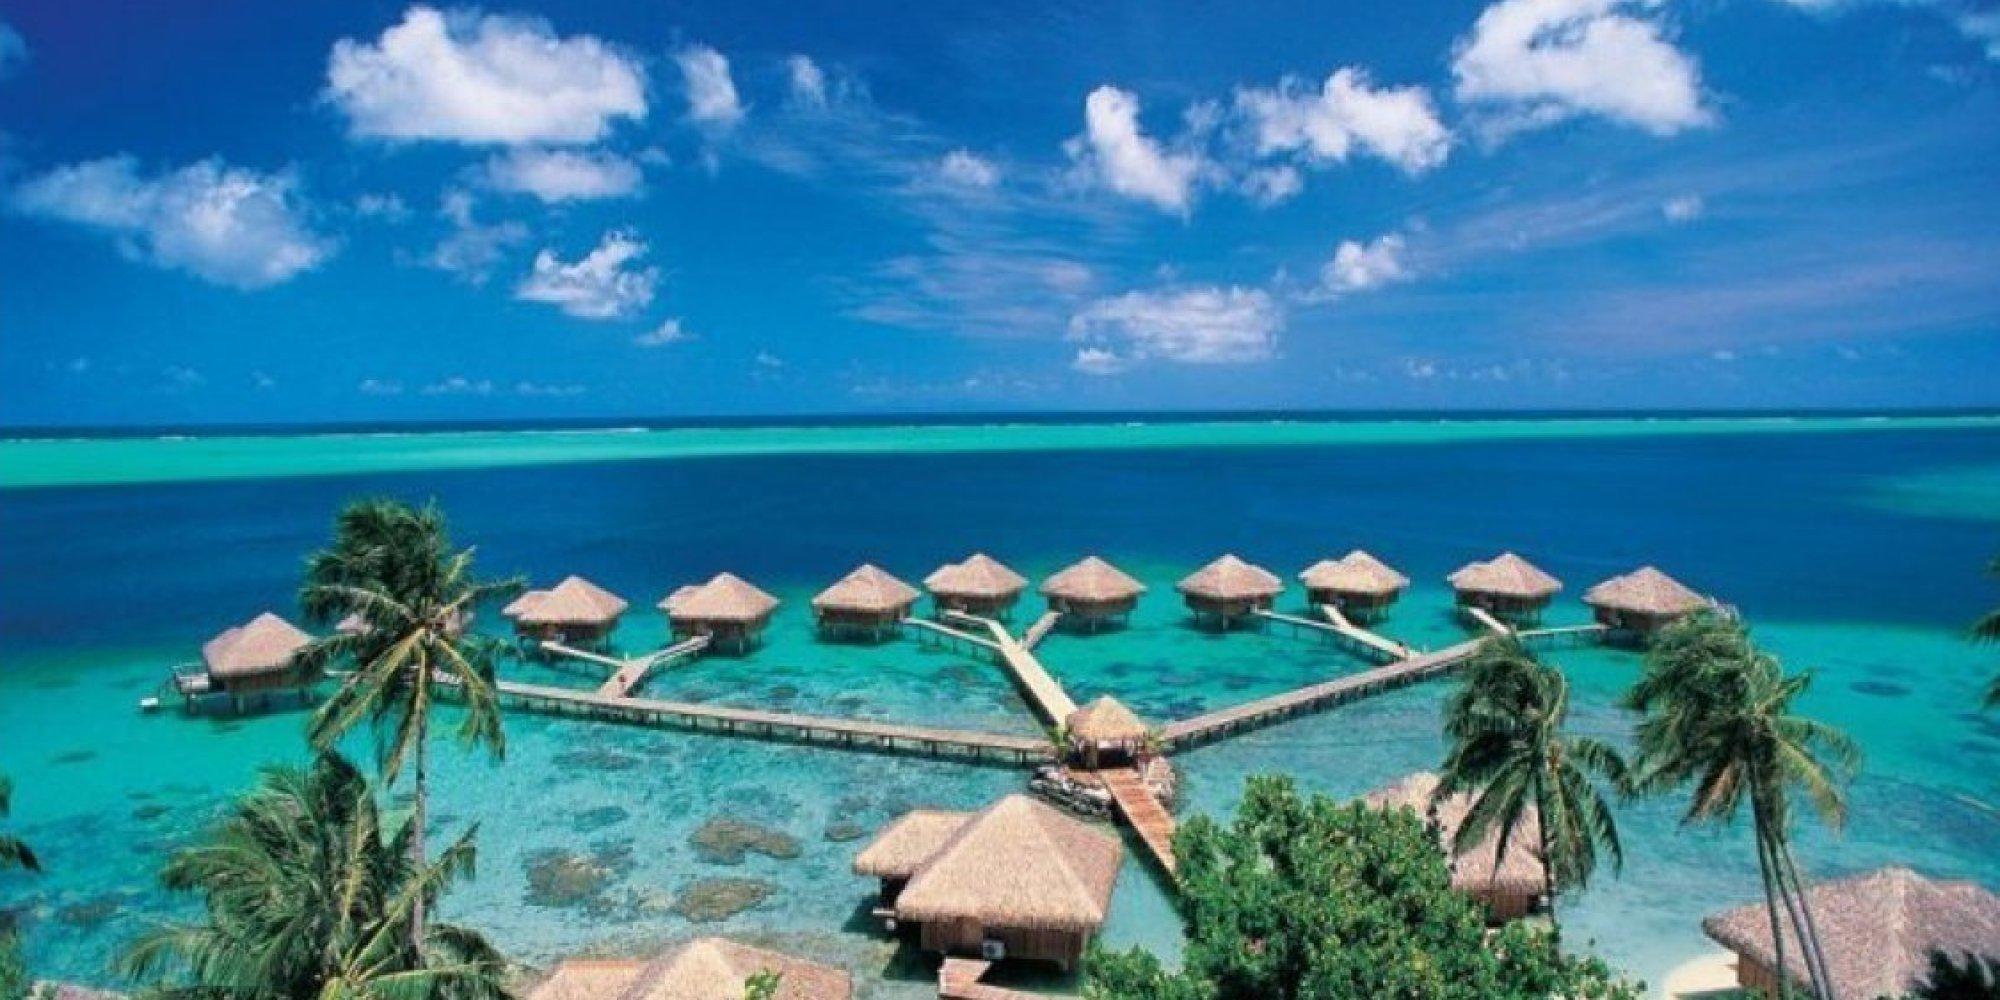 Hana Iti Beach, Huahine Island, Tahiti без смс